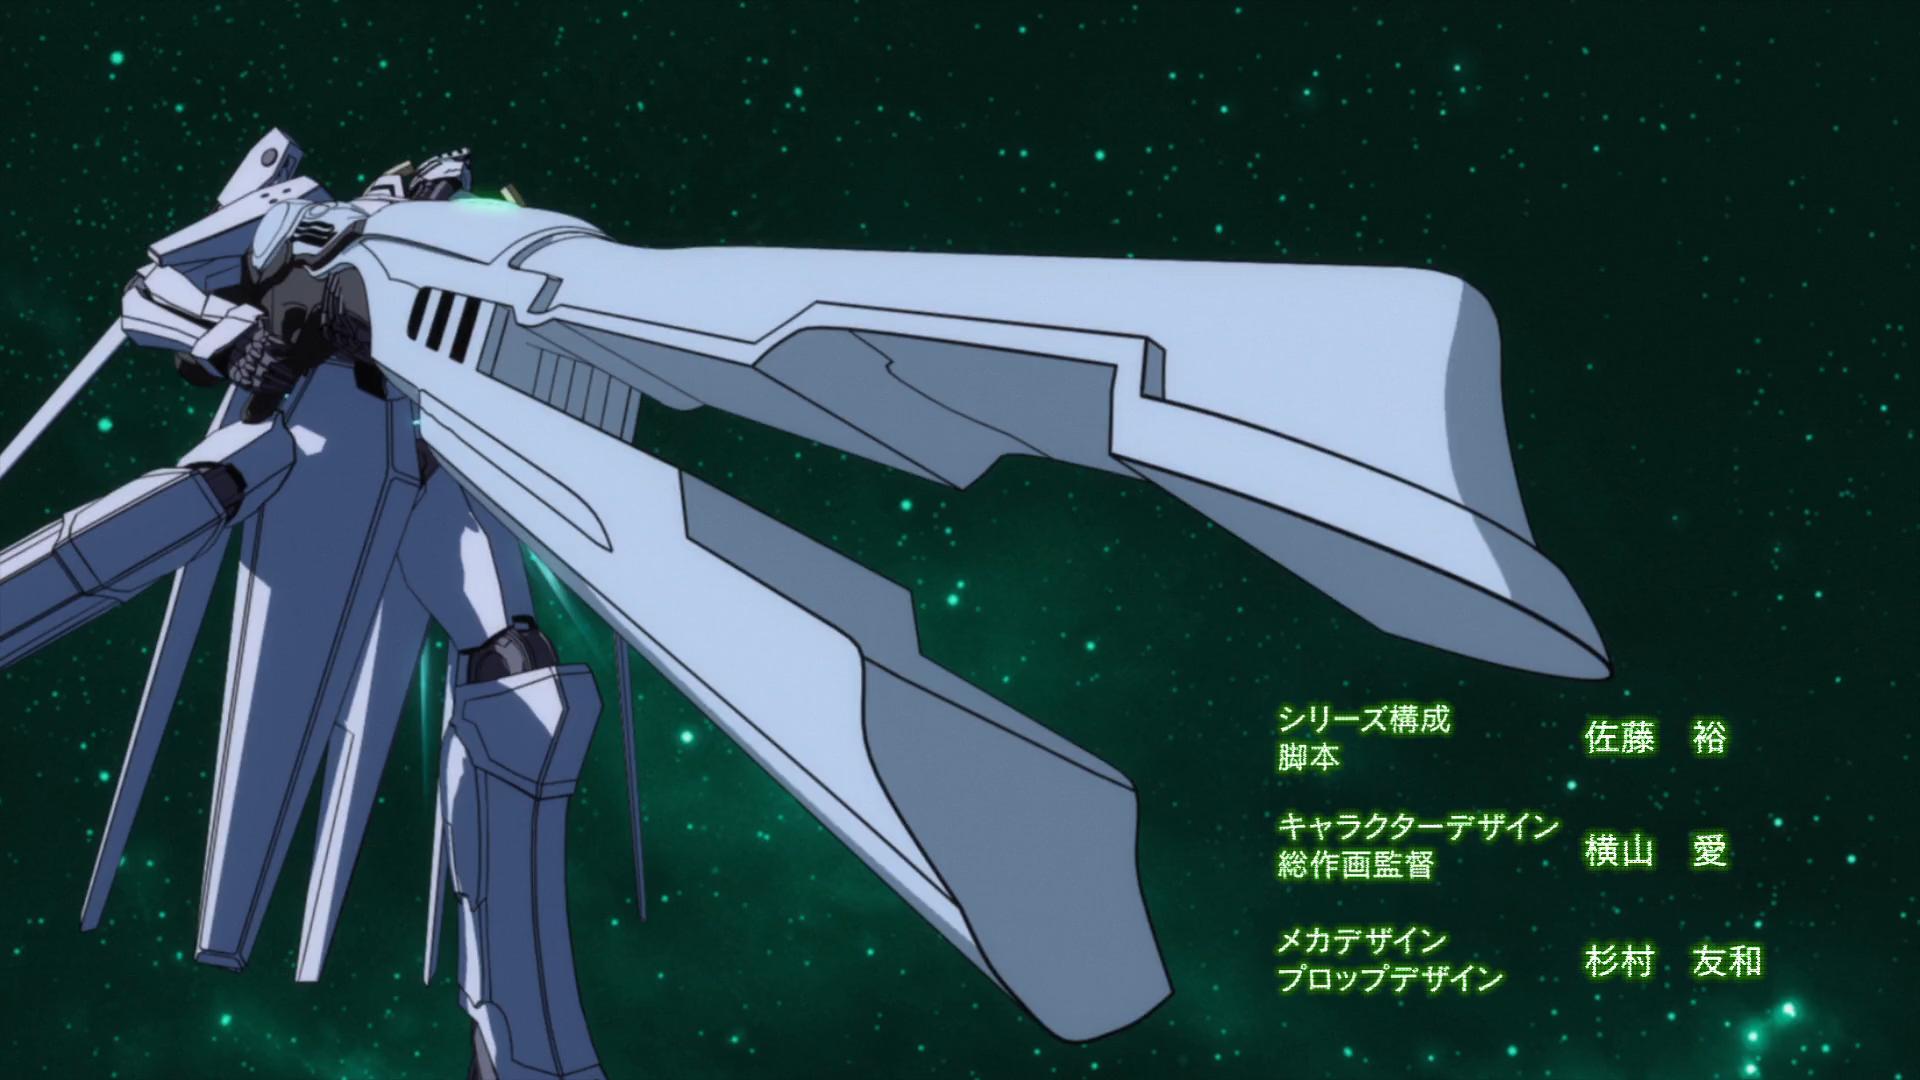 [Golumpa] Space Battleship Tiramisu S2 - 11 (Uchuu Senkan